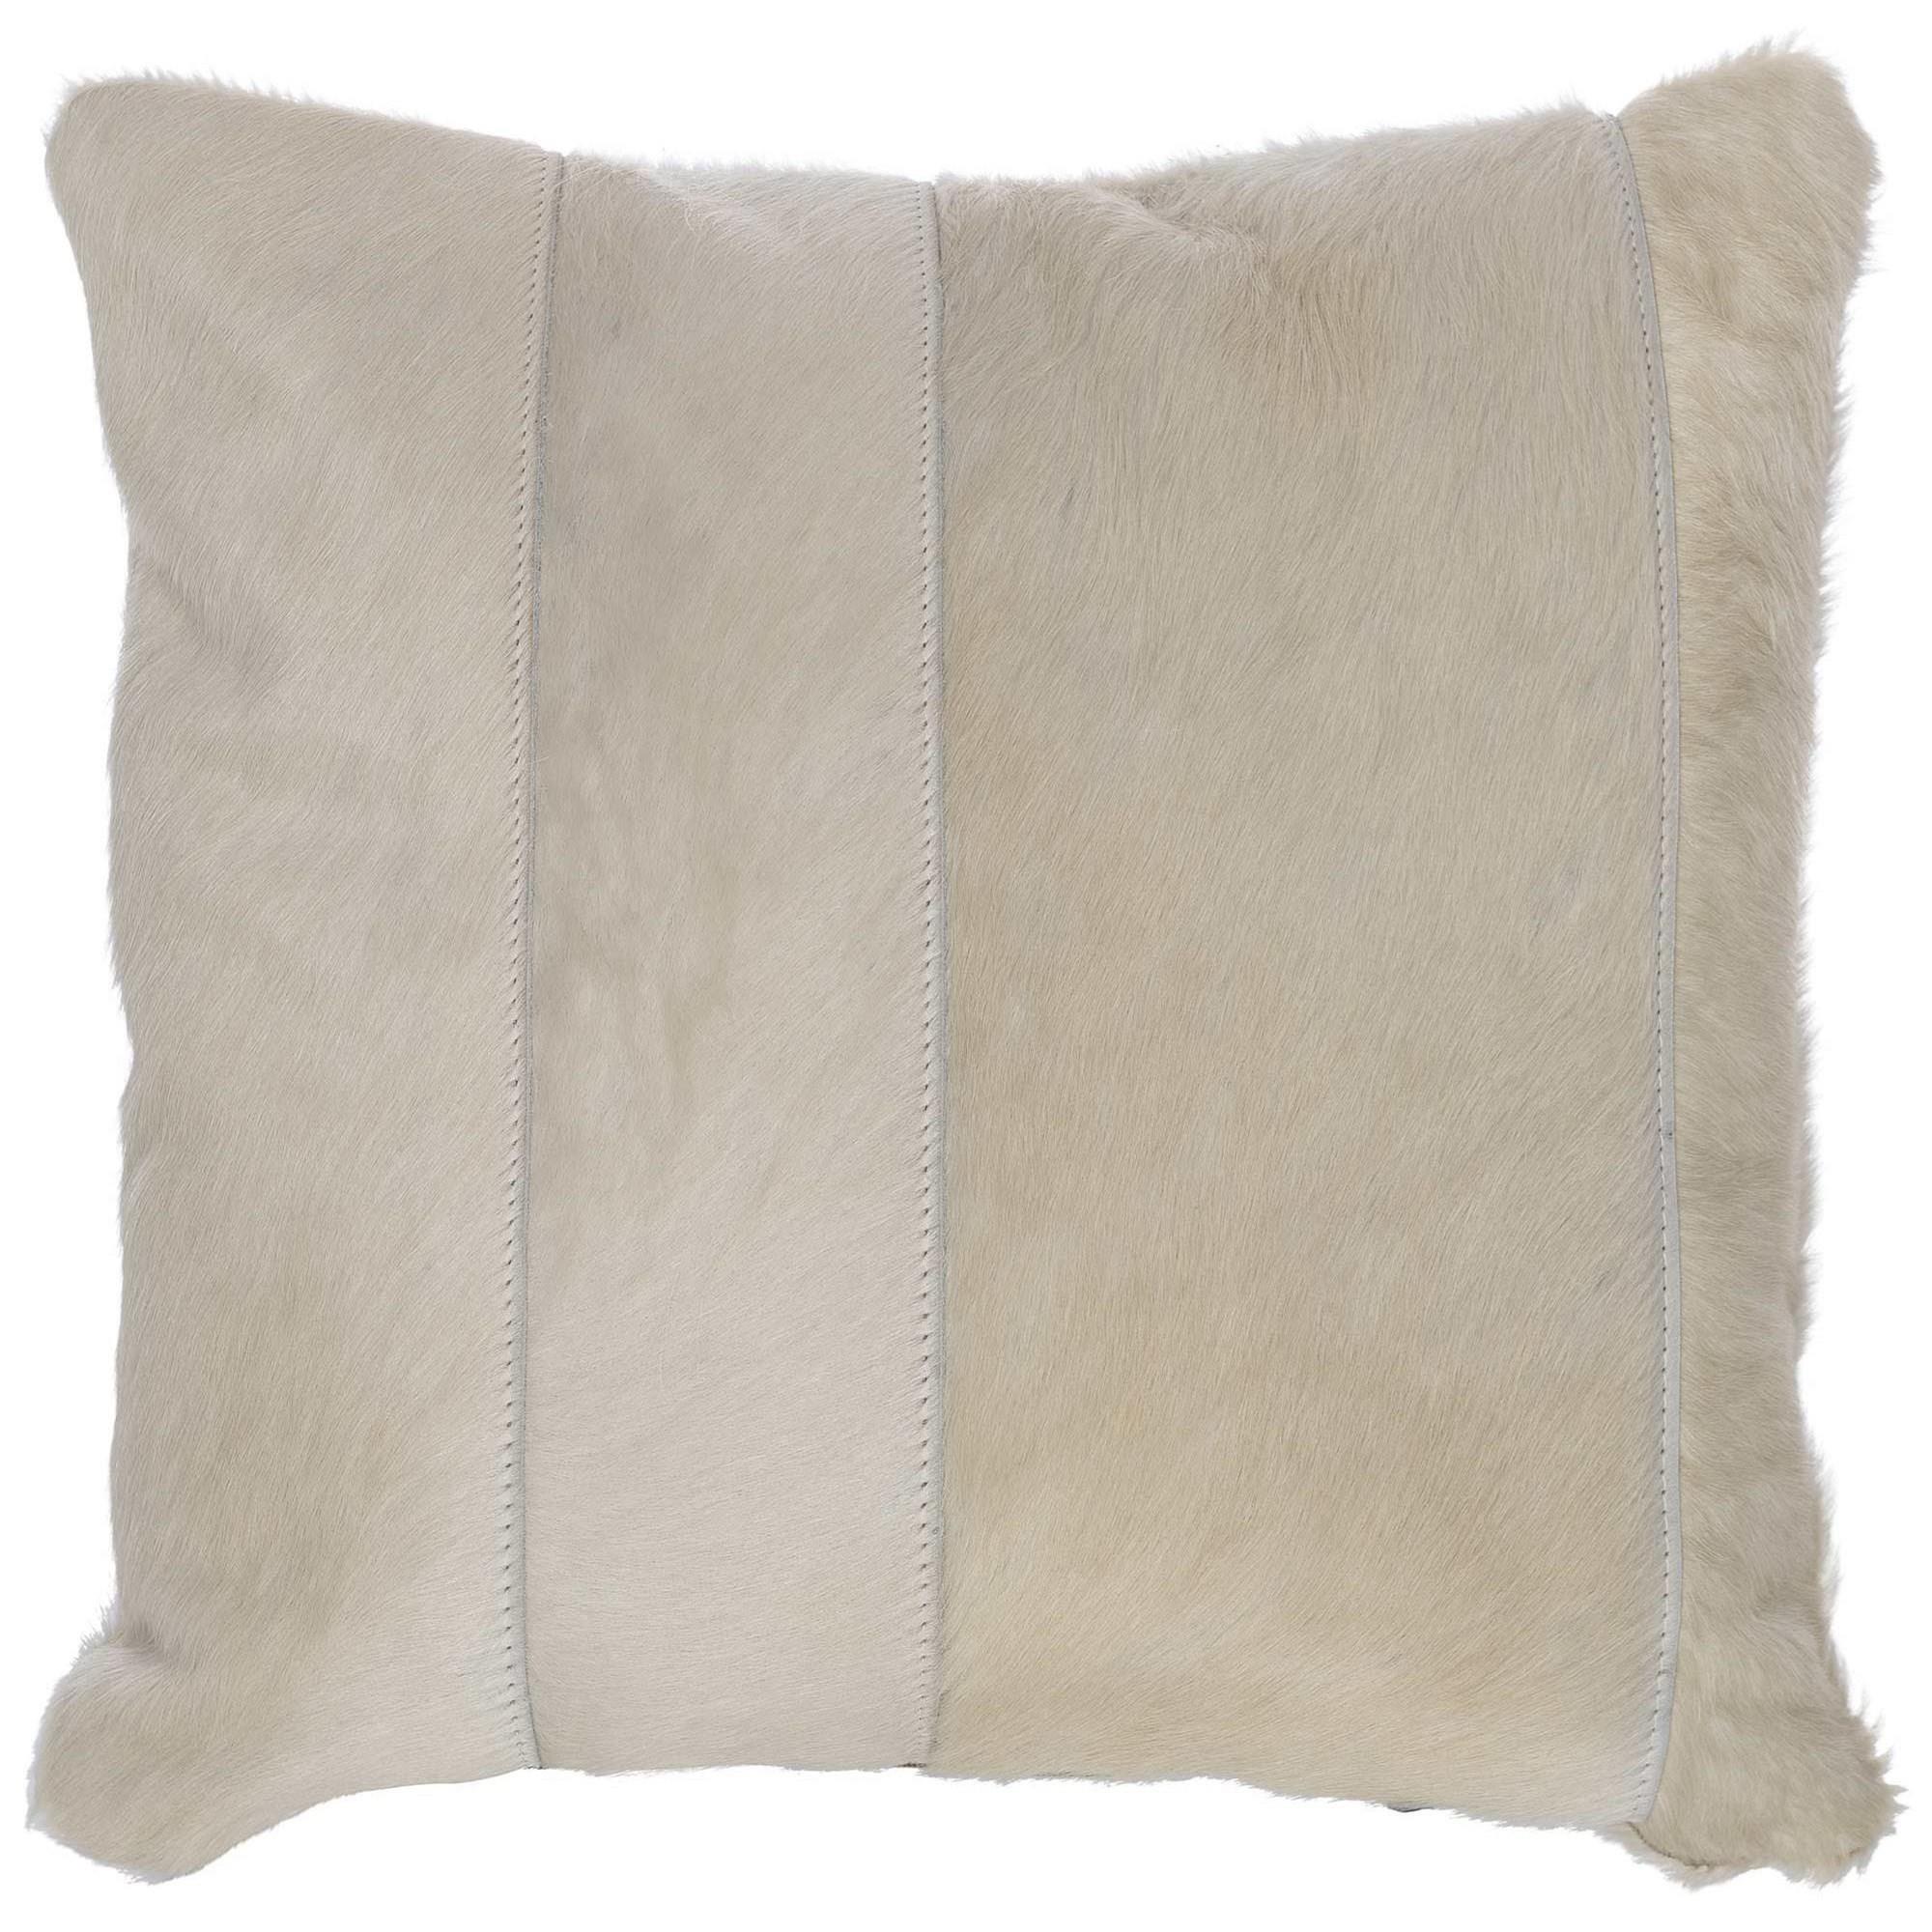 "Custom Decorative Pillows Knife Edge Square weltless (20"" x 20"") at Williams & Kay"